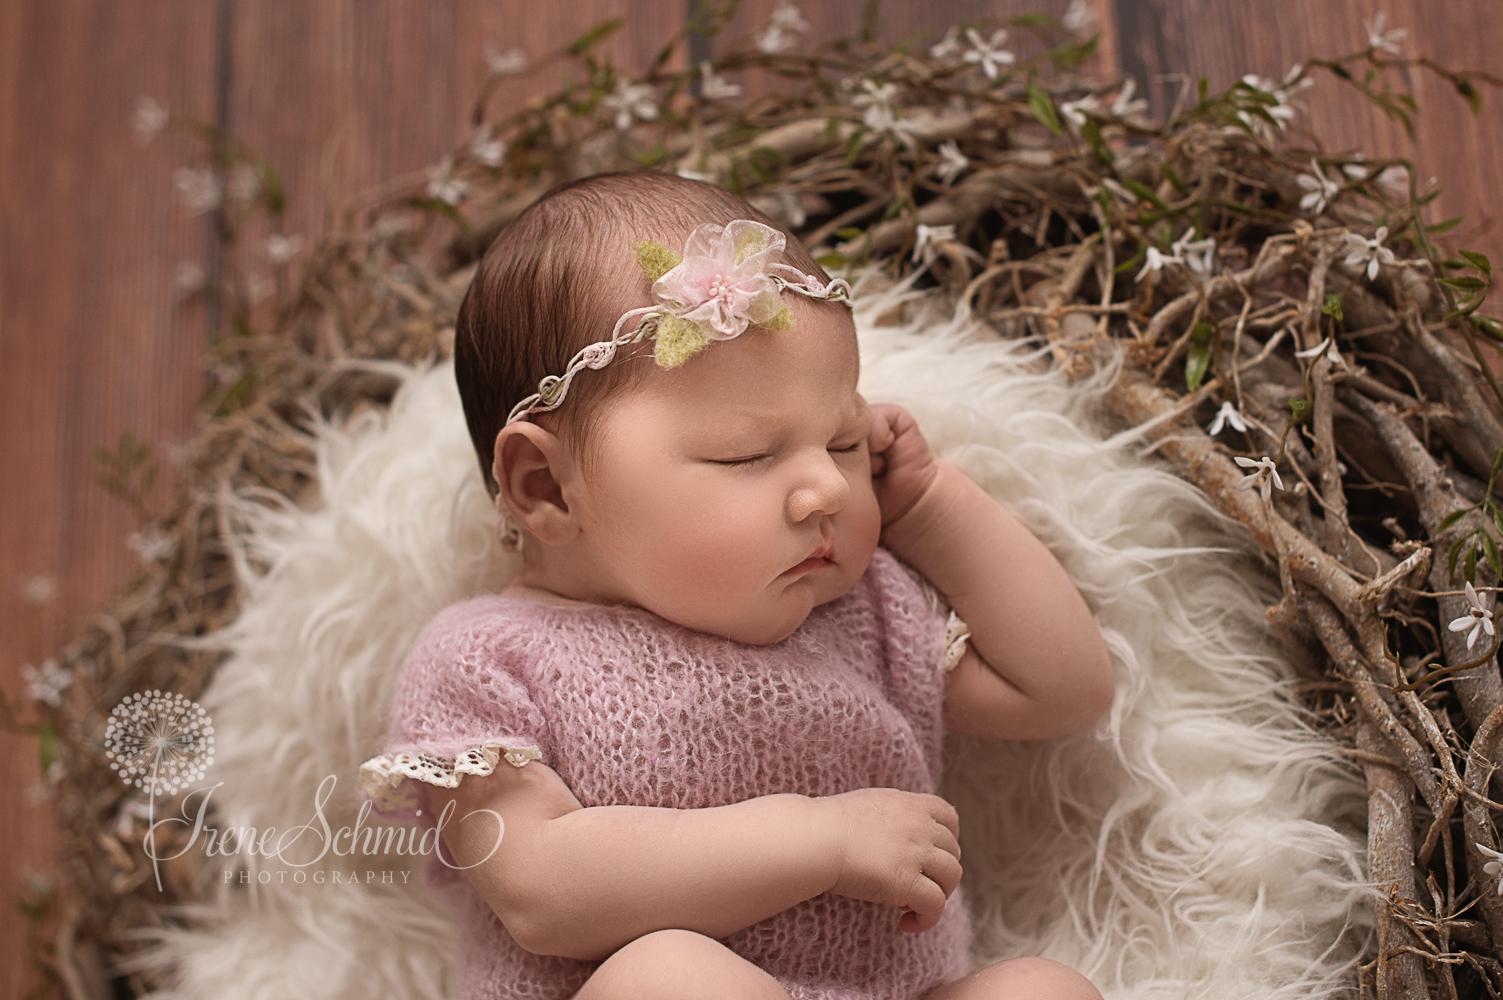 Babyfotografie in Winterthur